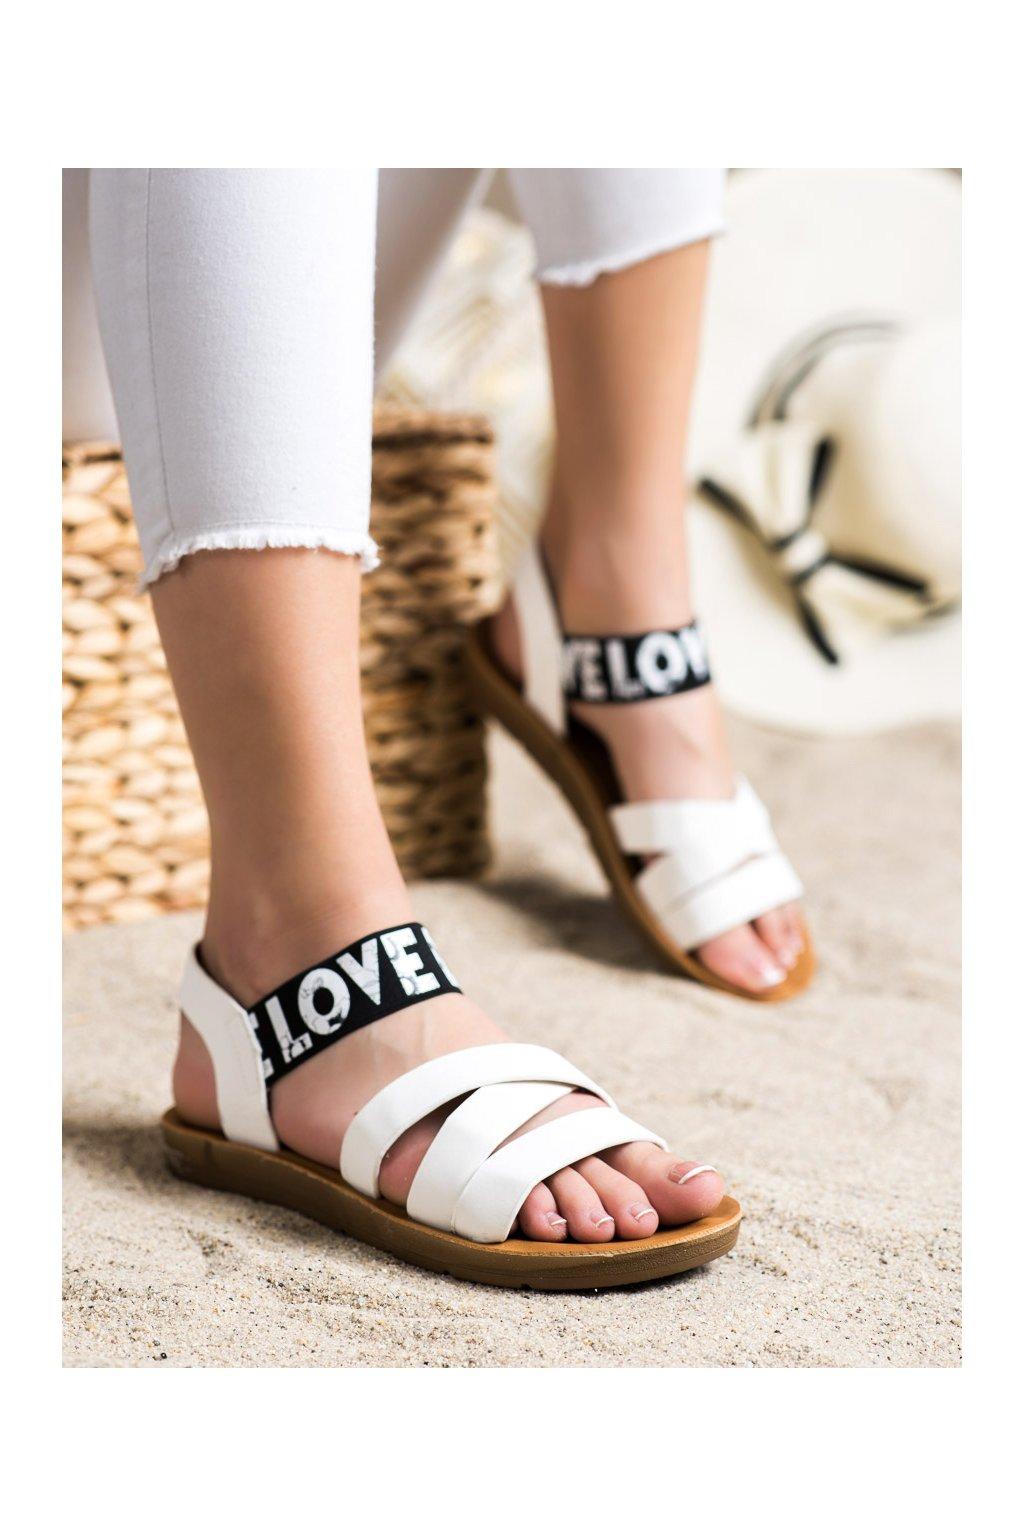 Biele sandále Shelovet kod E1503W